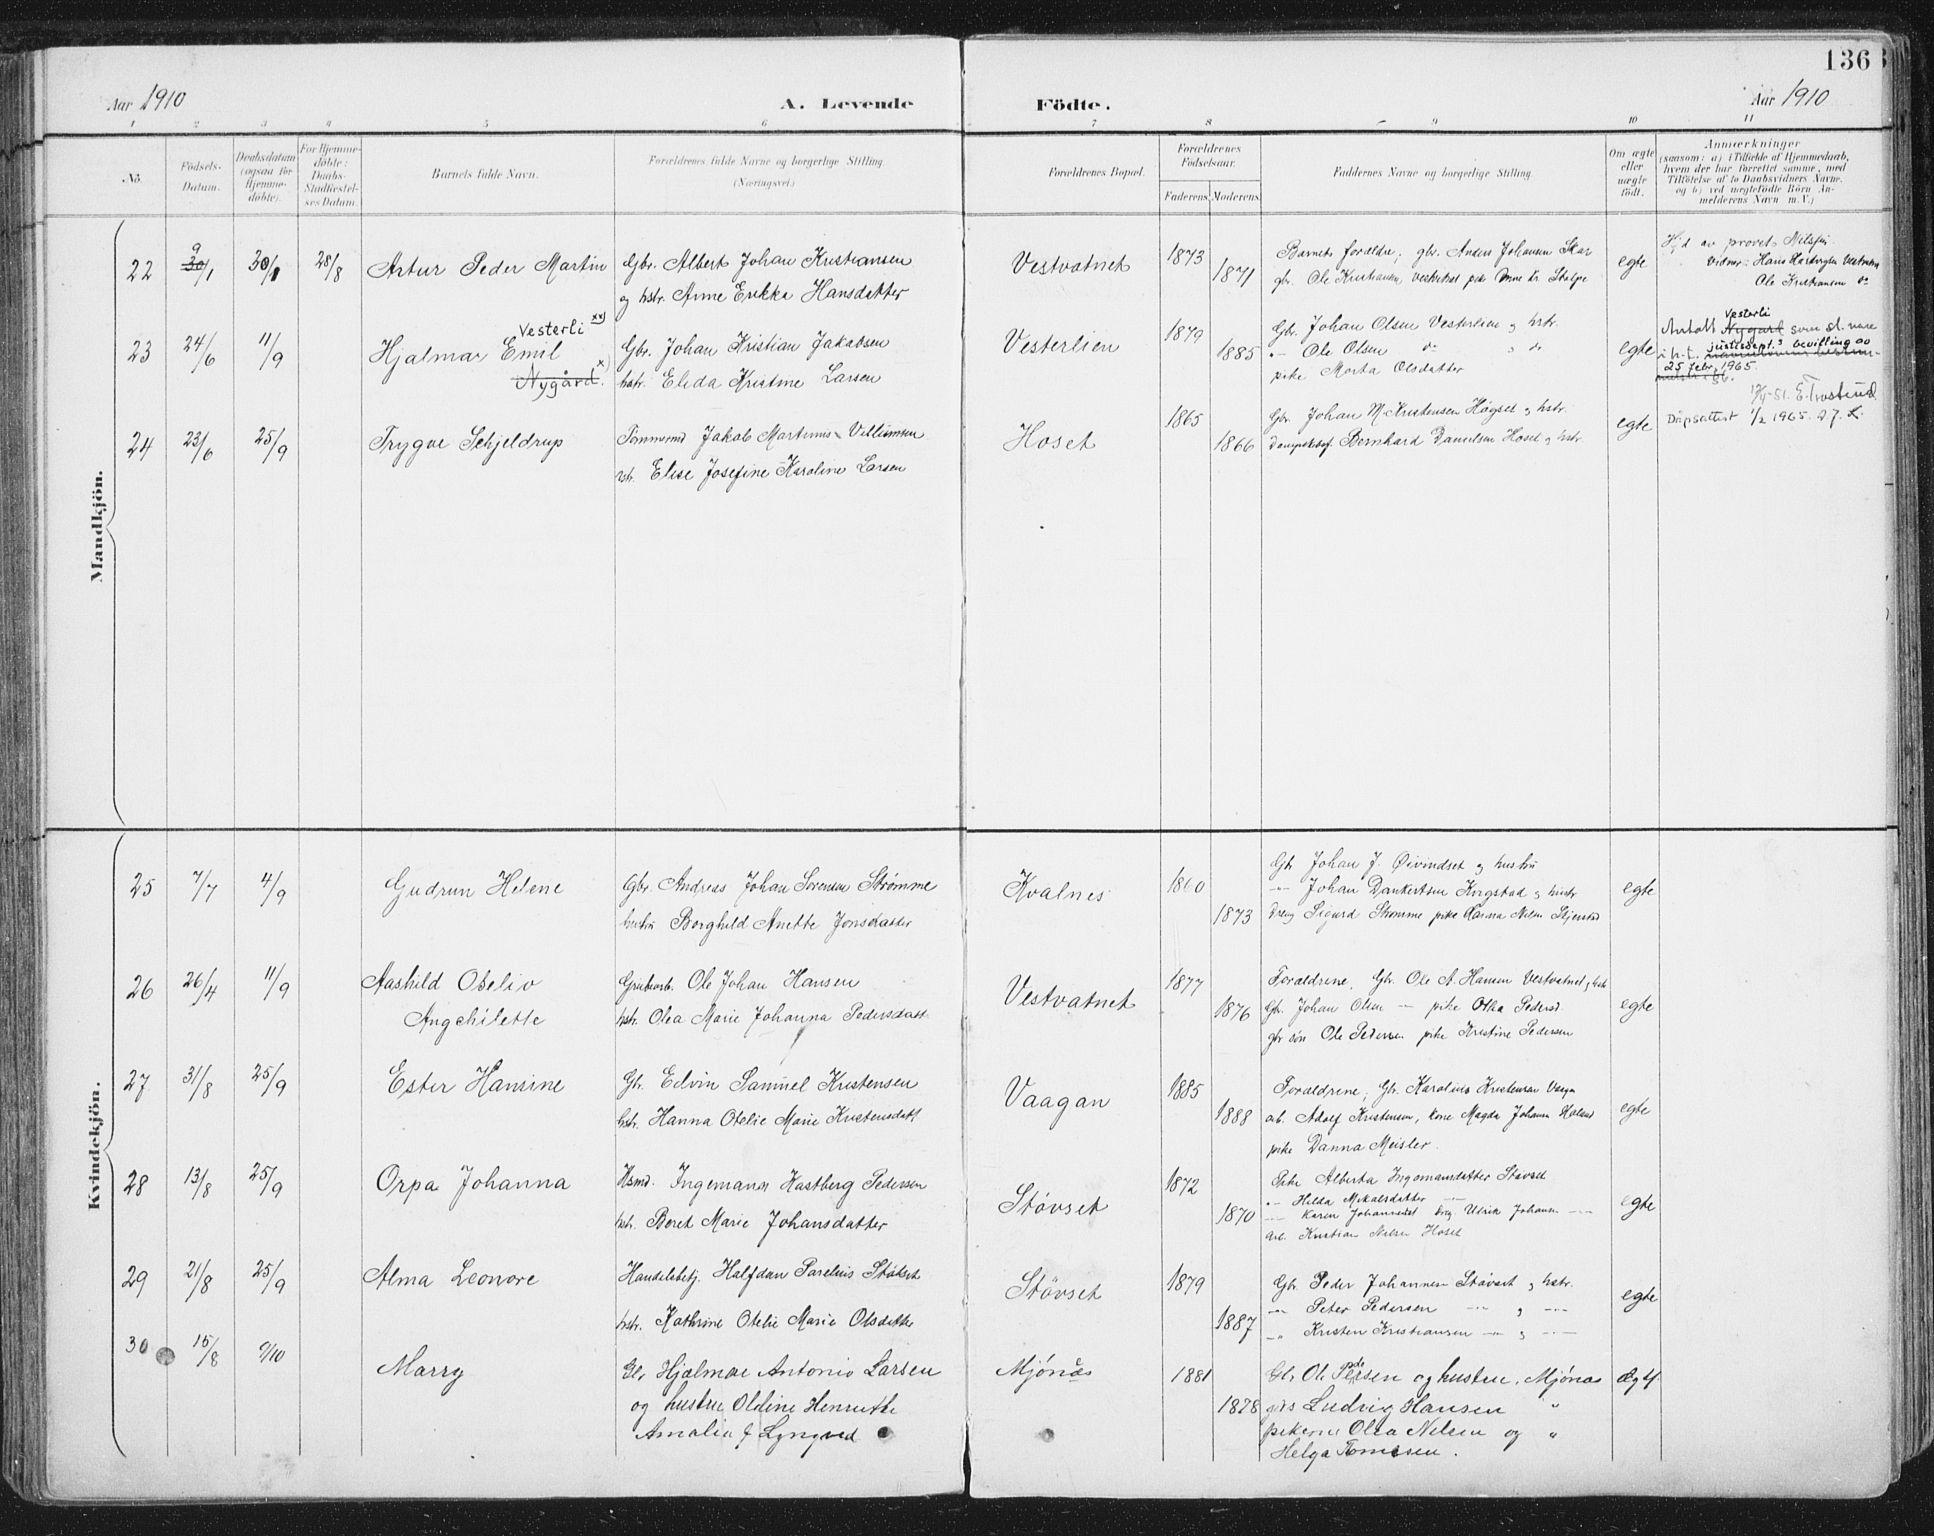 SAT, Ministerialprotokoller, klokkerbøker og fødselsregistre - Nordland, 852/L0741: Ministerialbok nr. 852A11, 1894-1917, s. 136